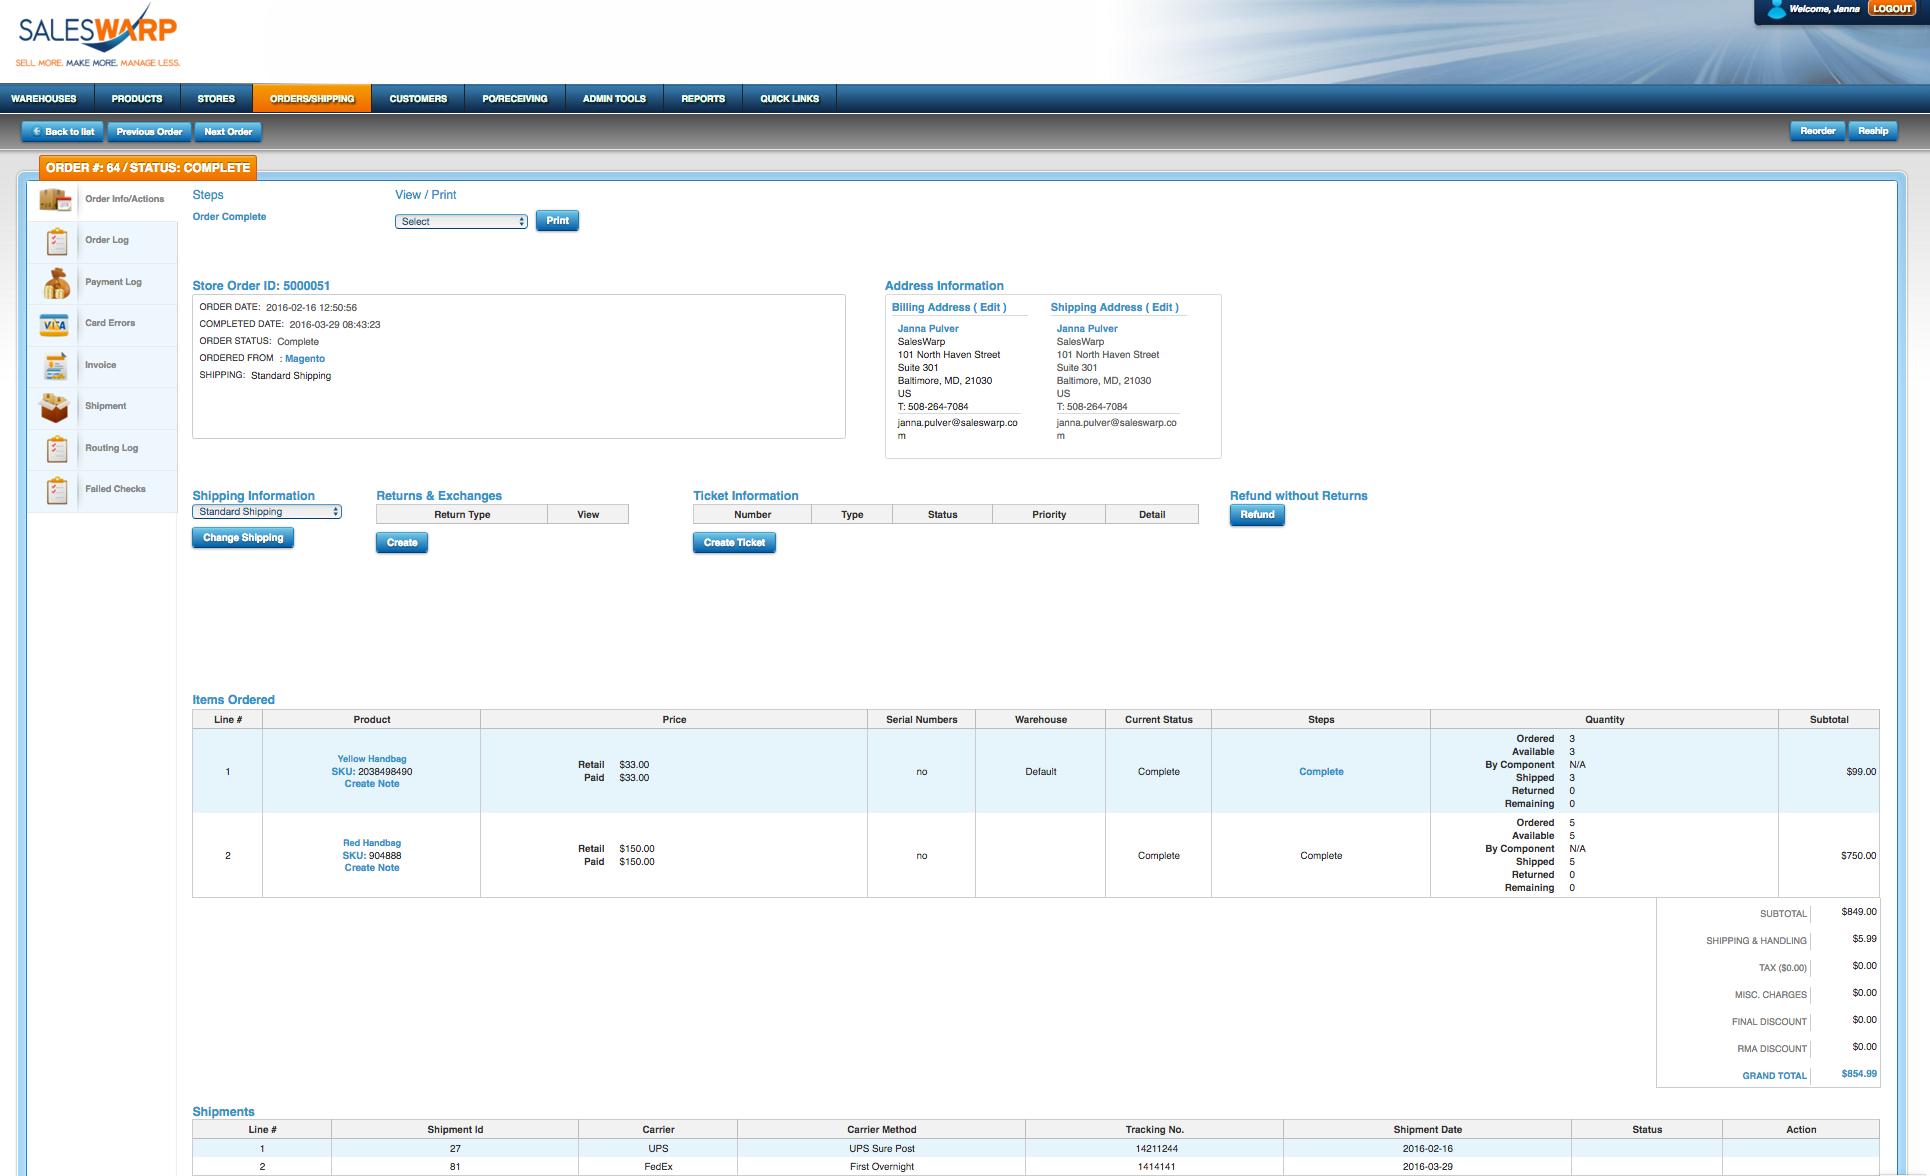 SalesWarp Software - 2